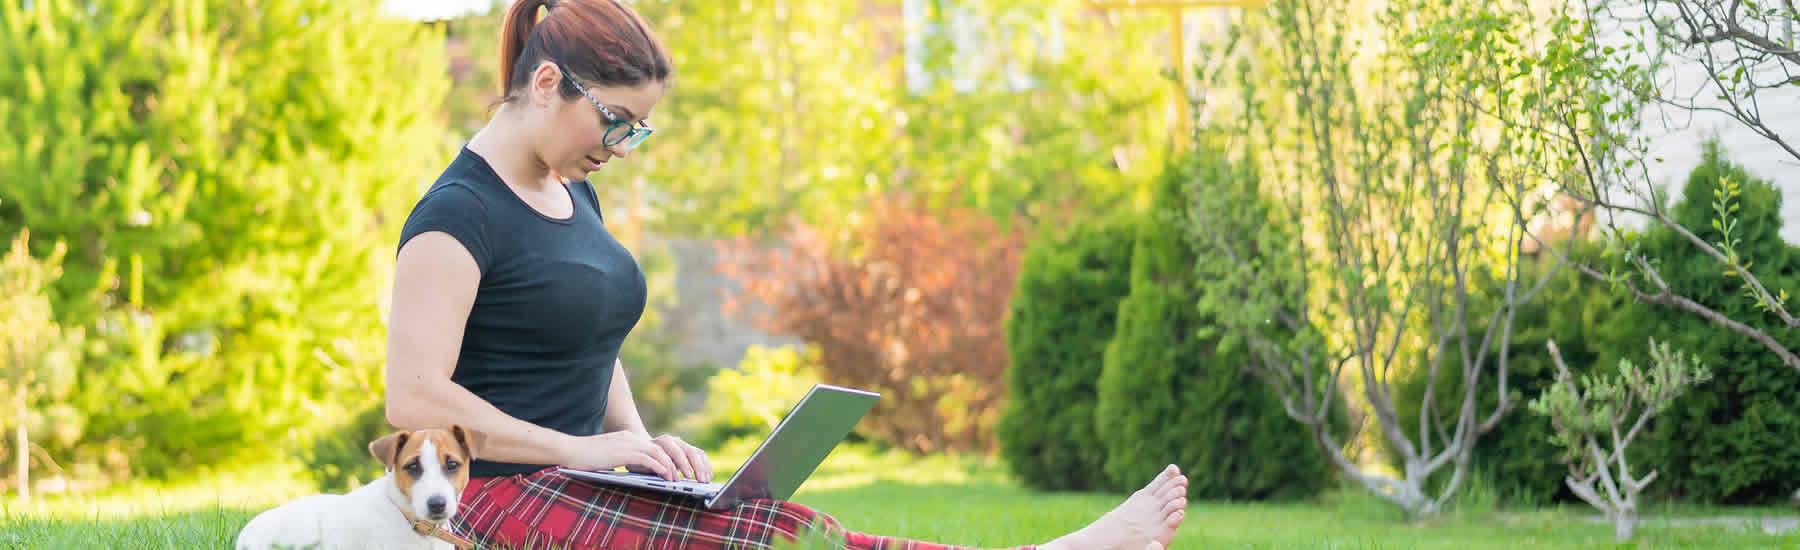 LB Homes Fergus Falls apply online